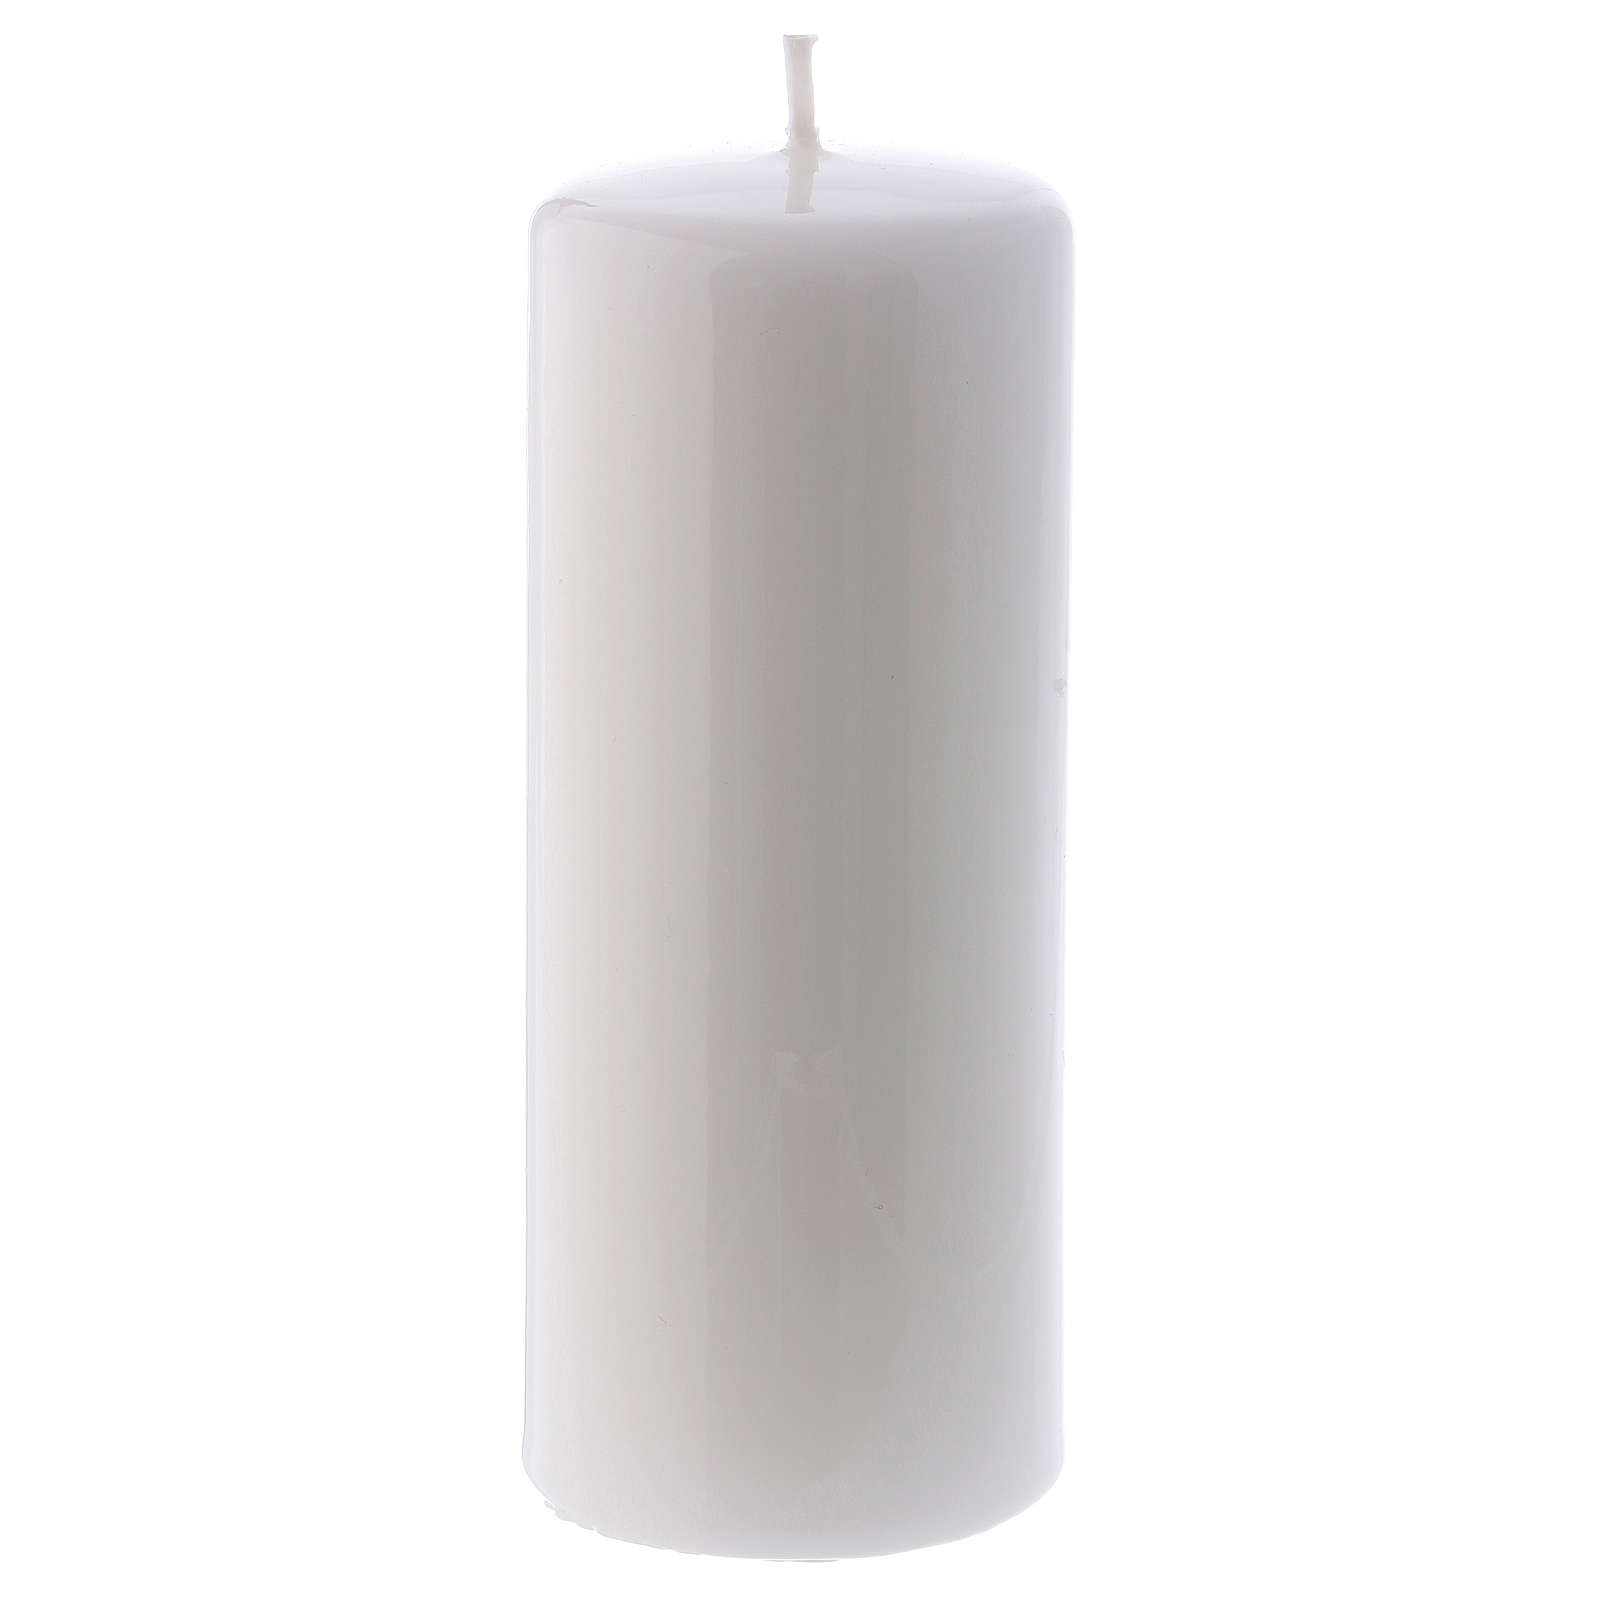 Vela branca Brilhante Ceralacca 6x15 cm 3